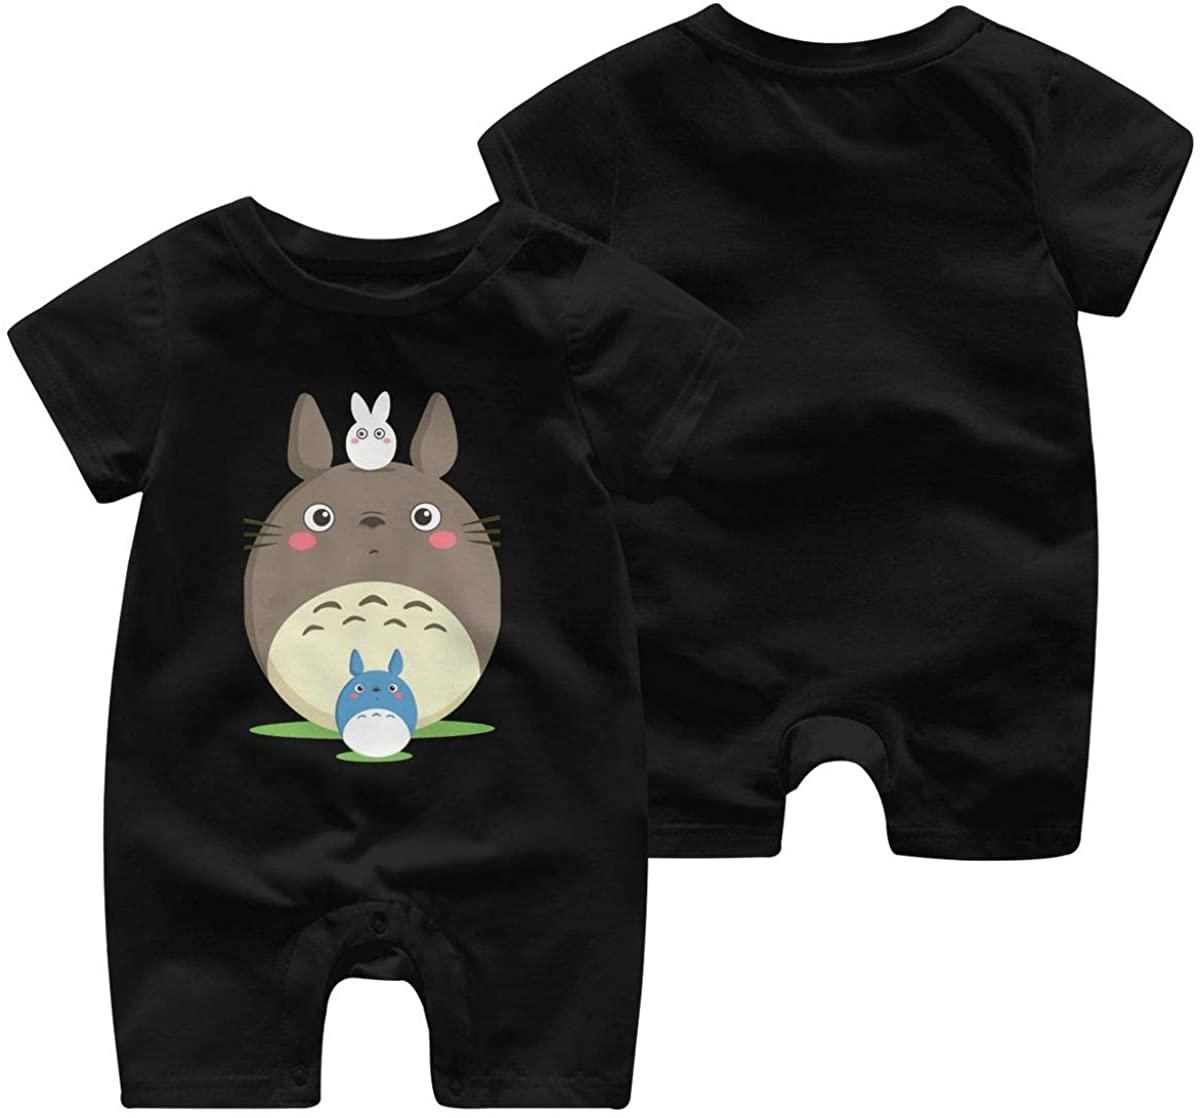 KisdFinda Totoro Baby boy Girl Short Sleeve Jumpsuit Short Sleeve Bodysuit Baby Funny Jumpsuit